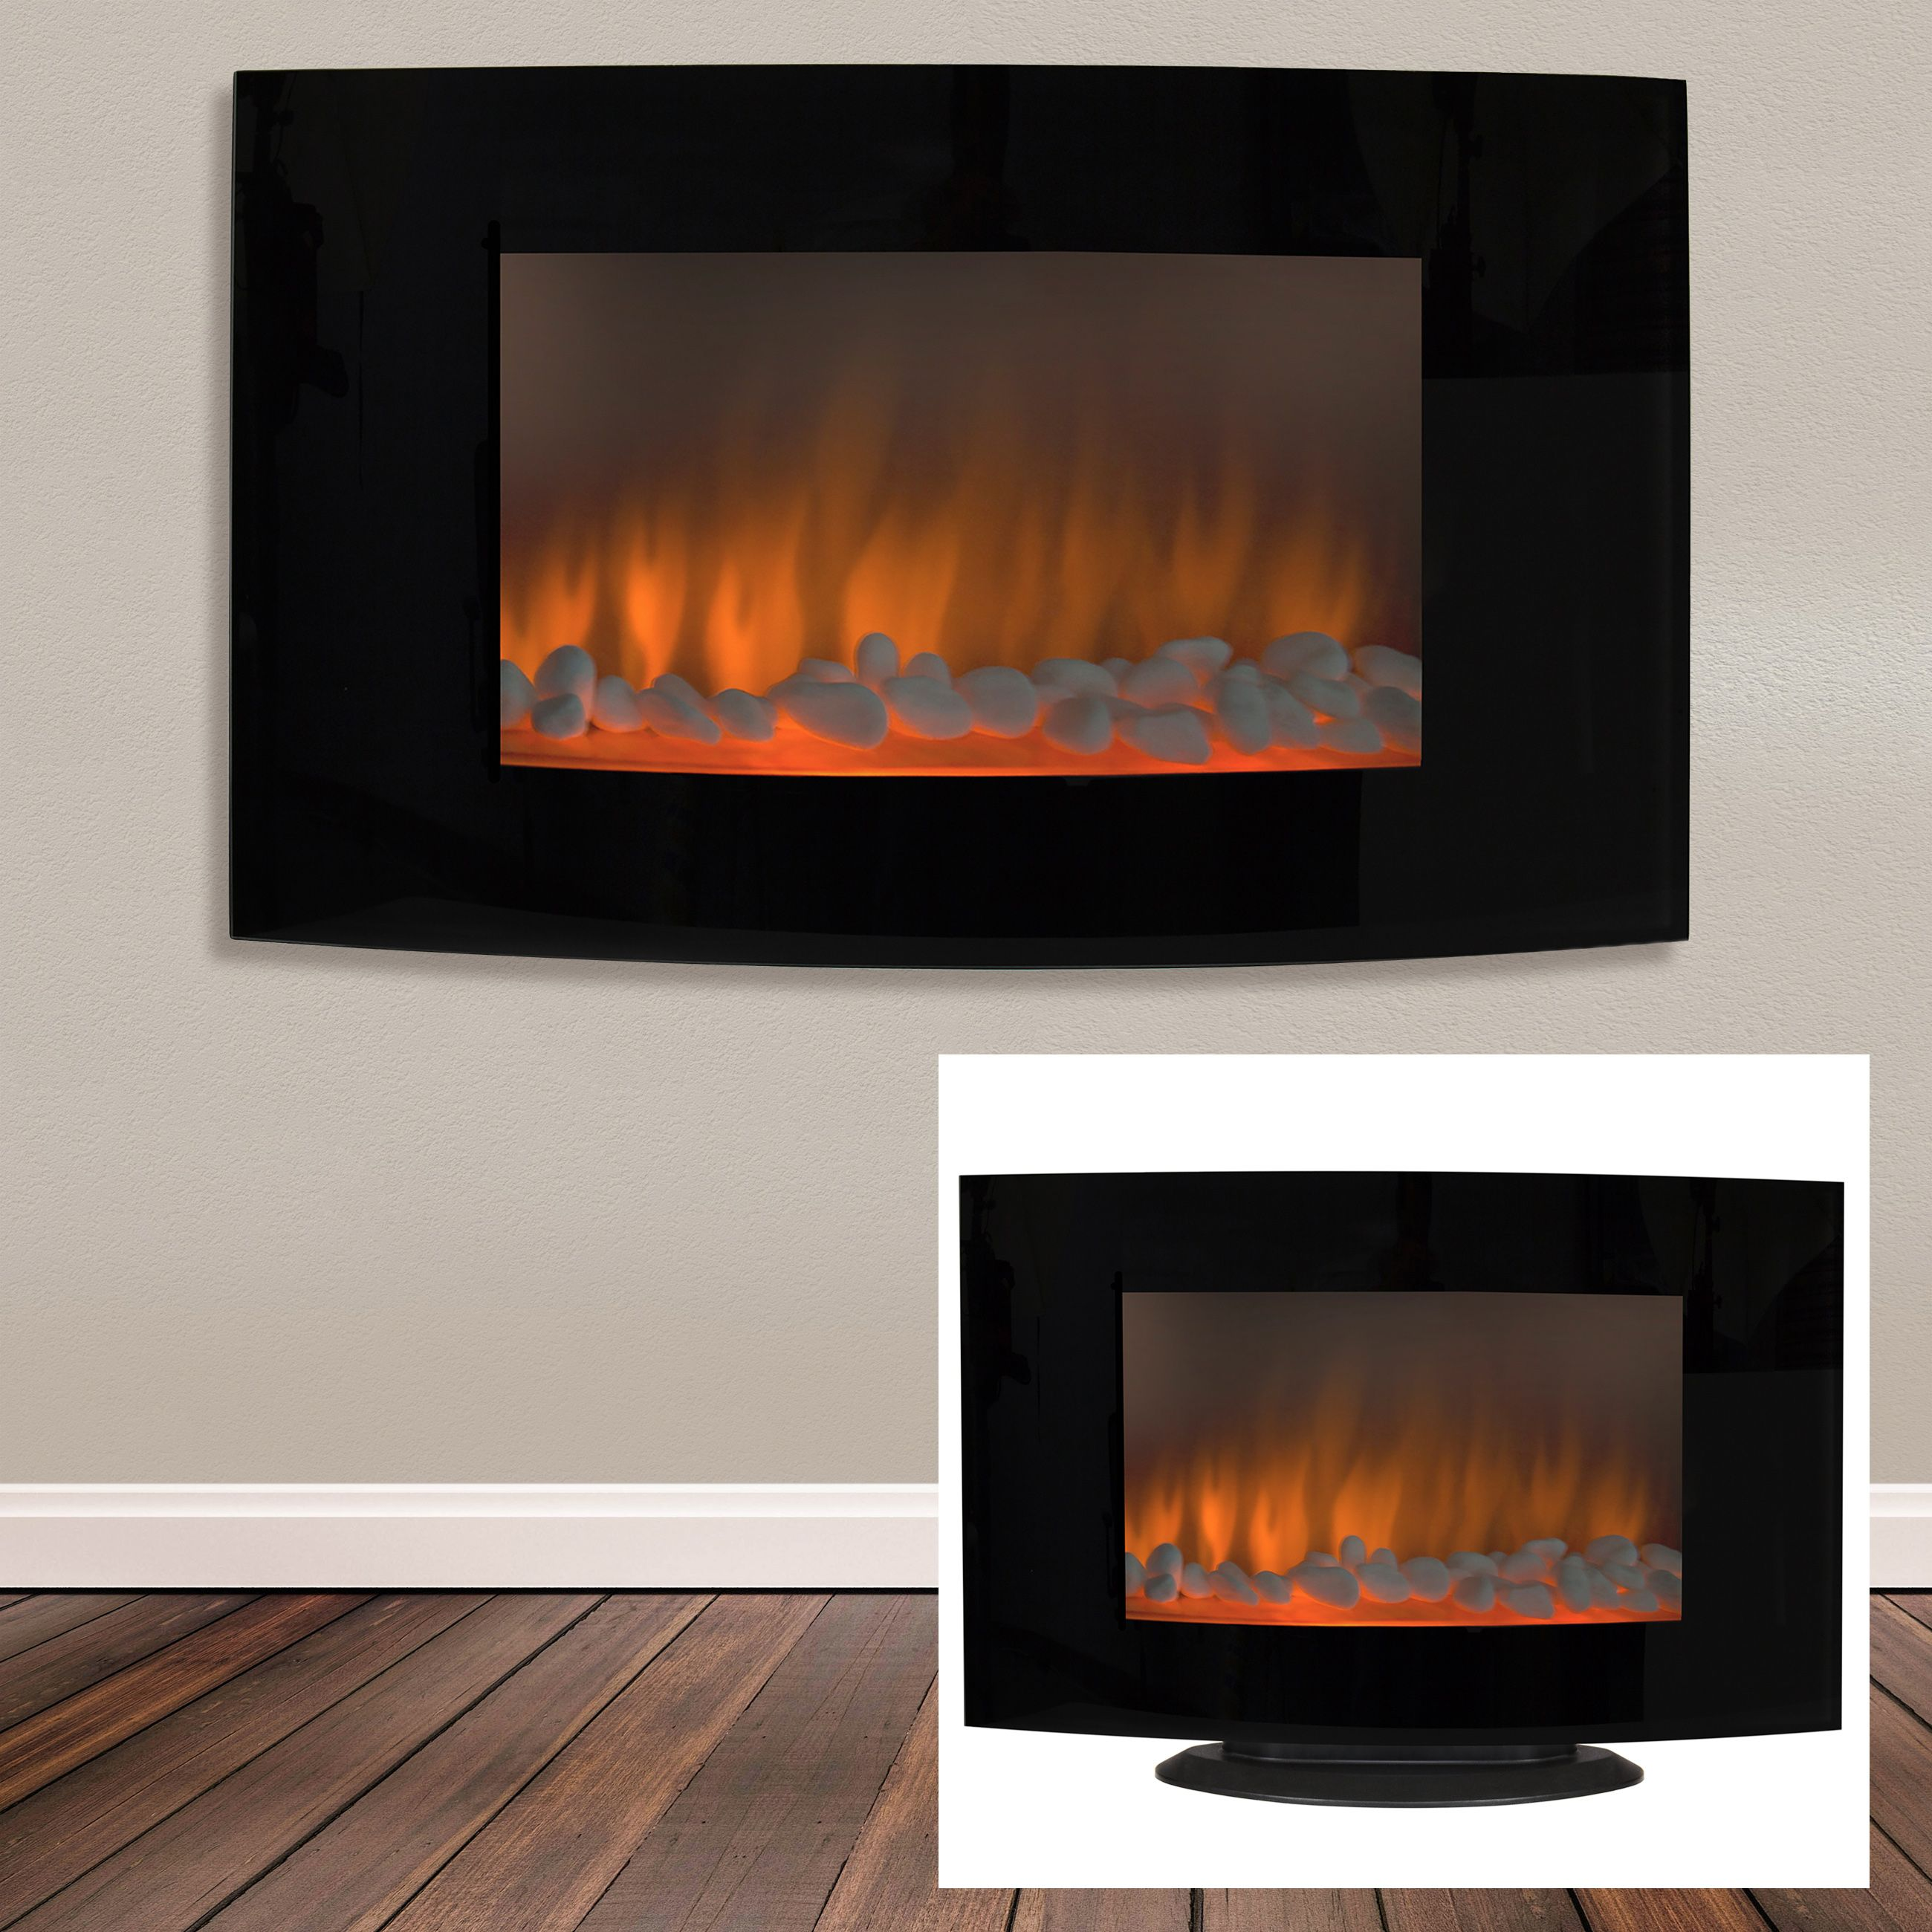 Home Improvement Fireplace Heater Wall Mounted Fireplace Electric Fireplace Heater